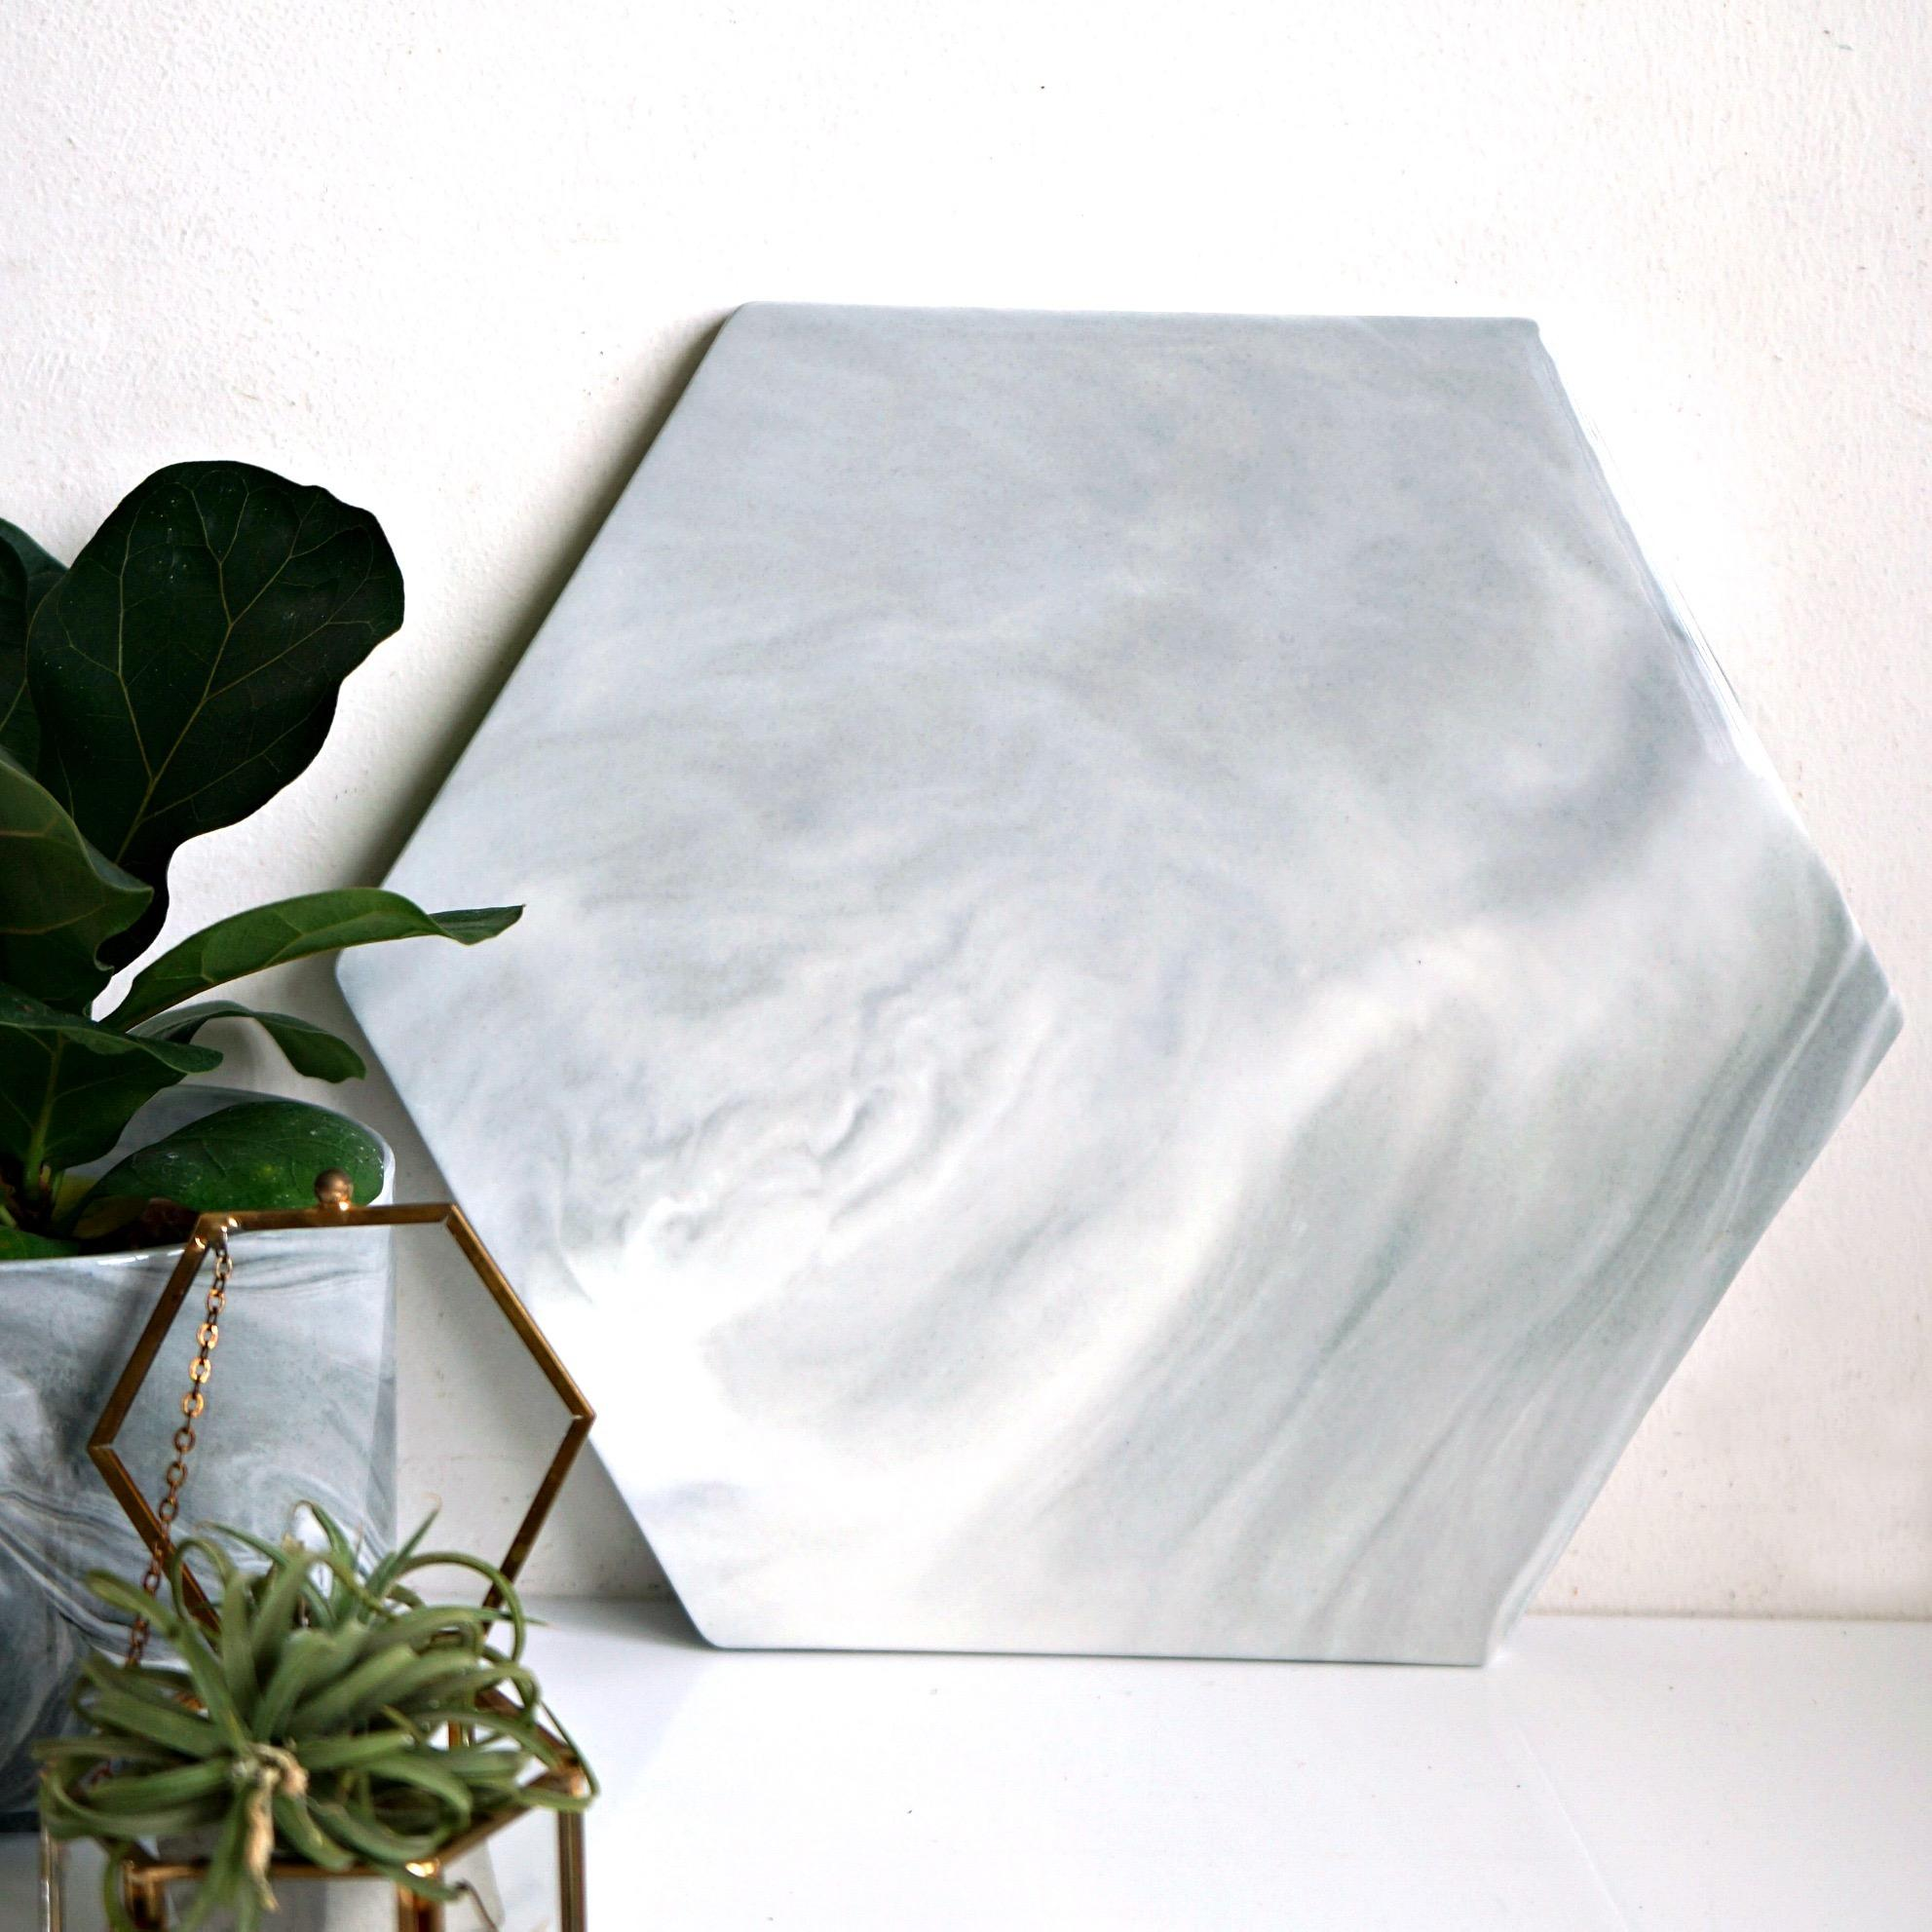 Buy 28Cm Greyish Hexagonal Marble Slab Cheap On Singapore